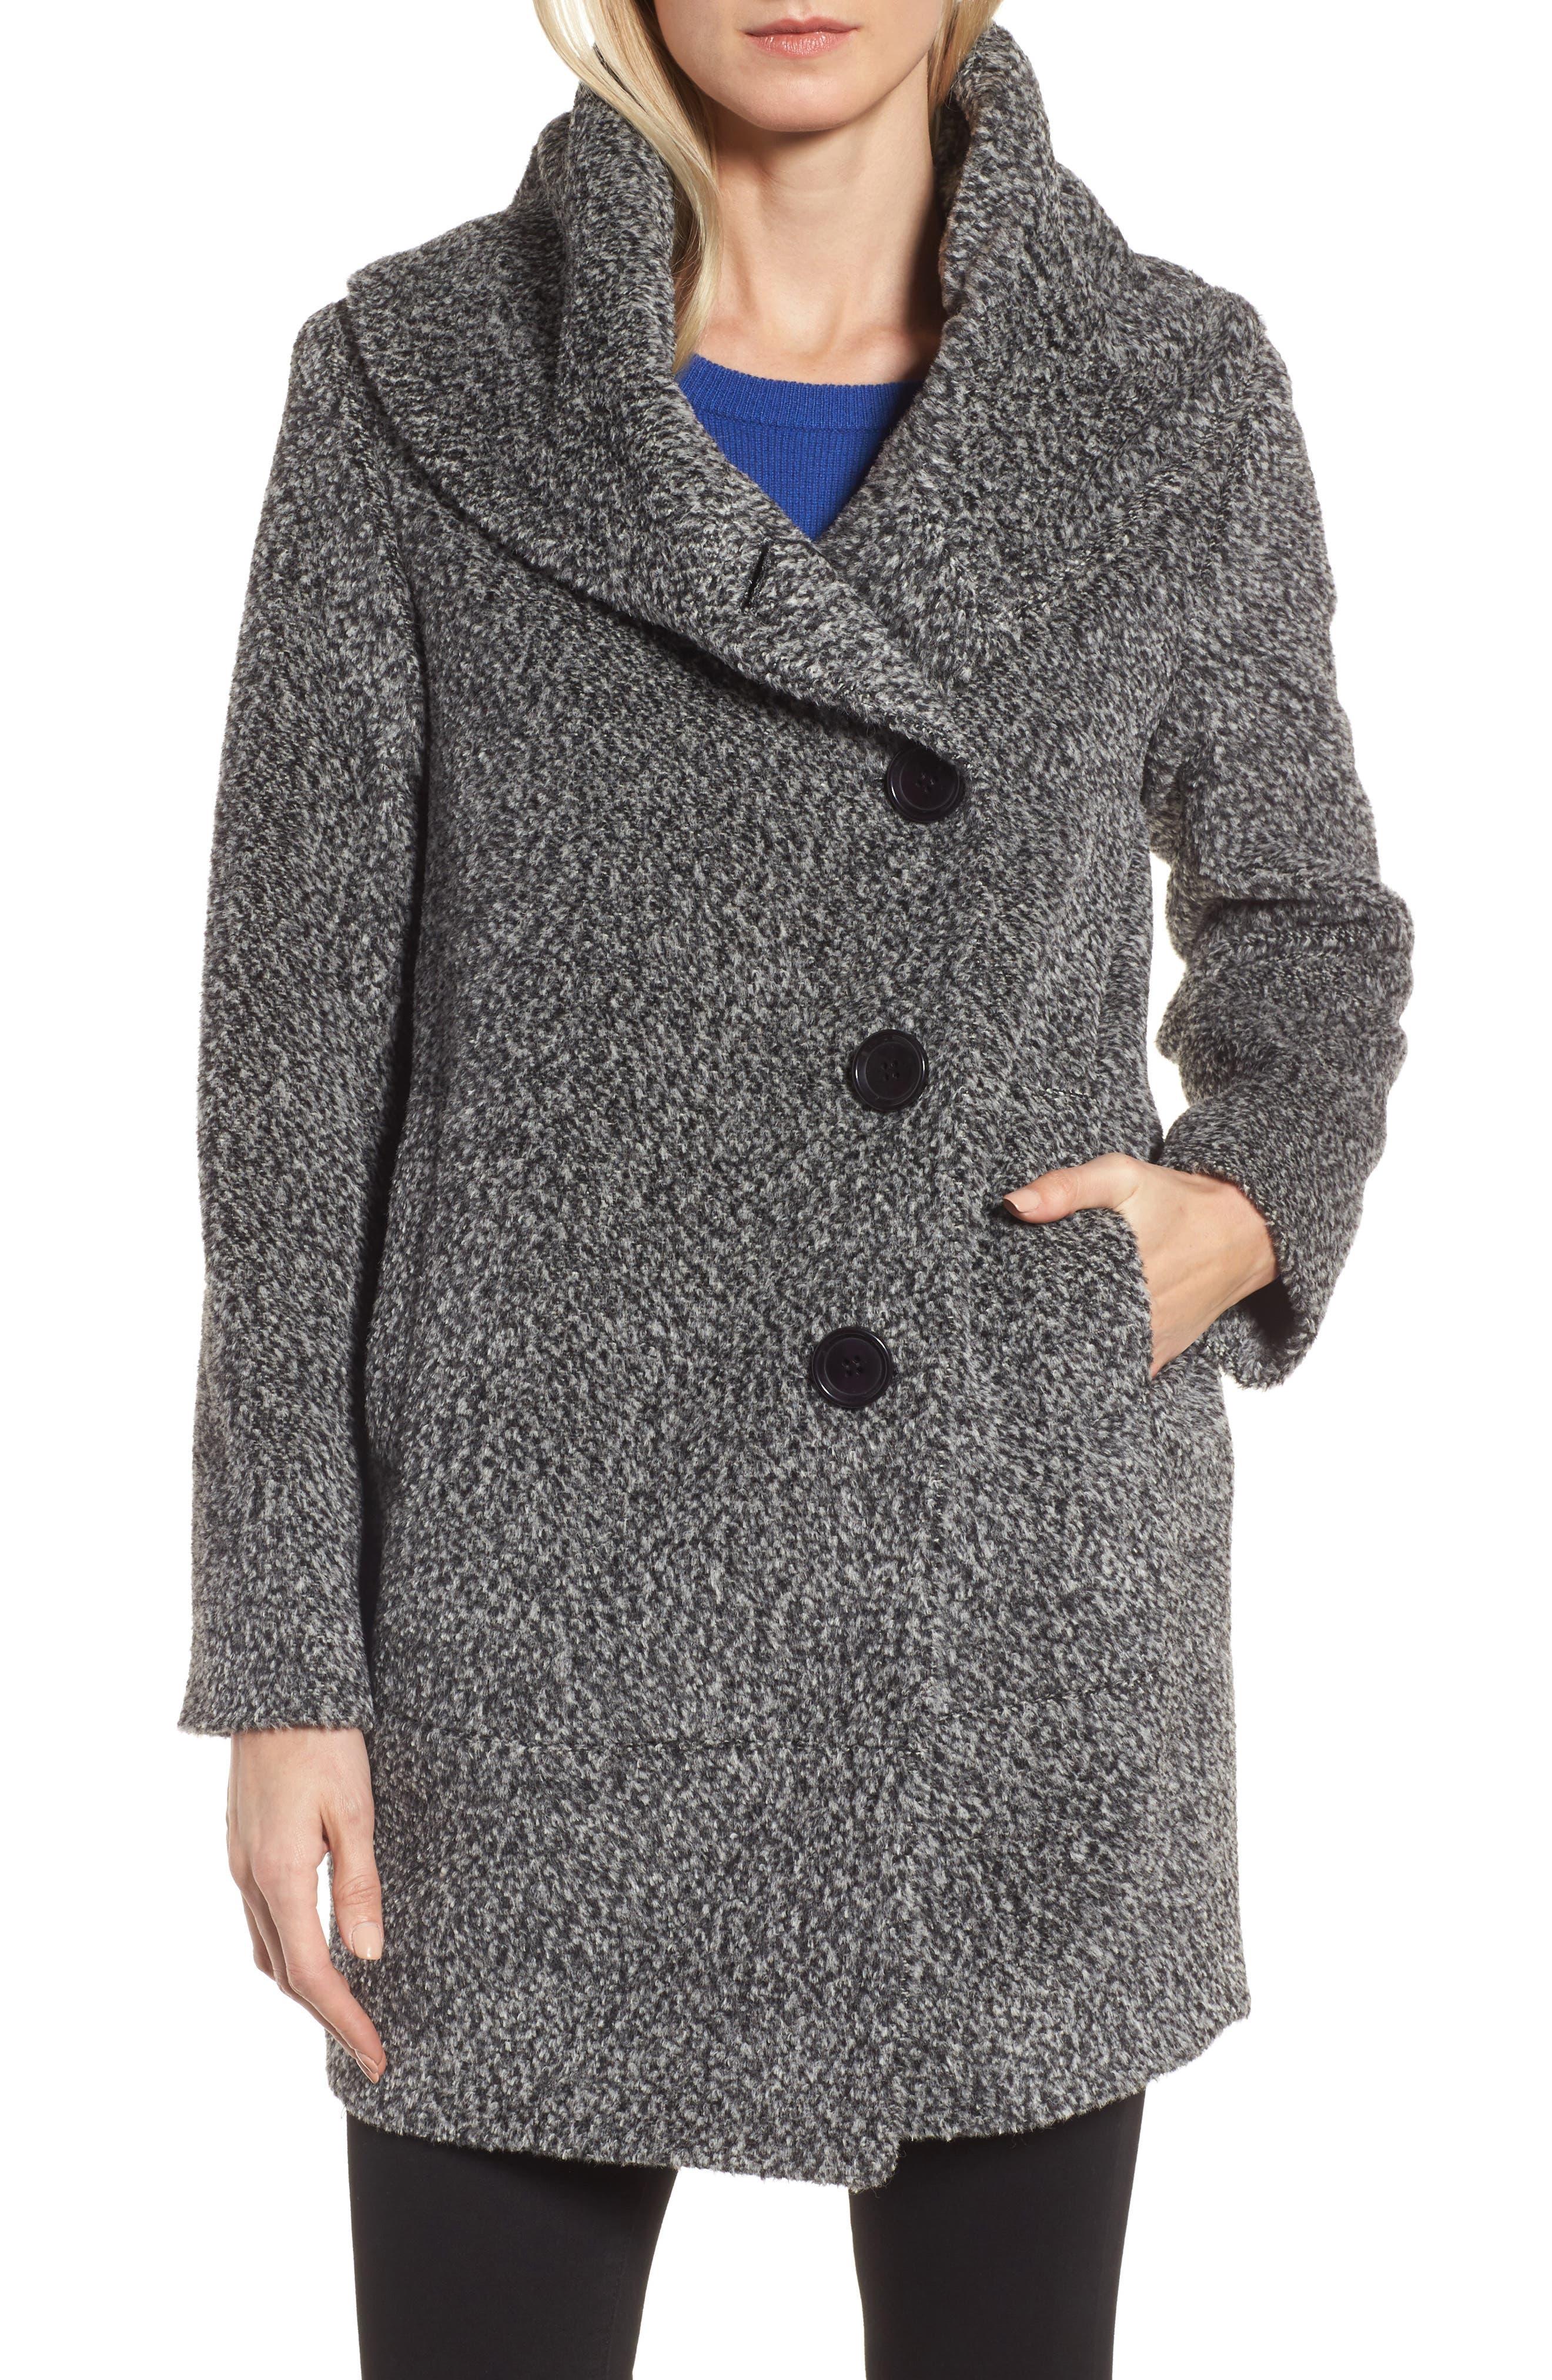 Alternate Image 1 Selected - Sofia Cashmere Wool Blend Coat